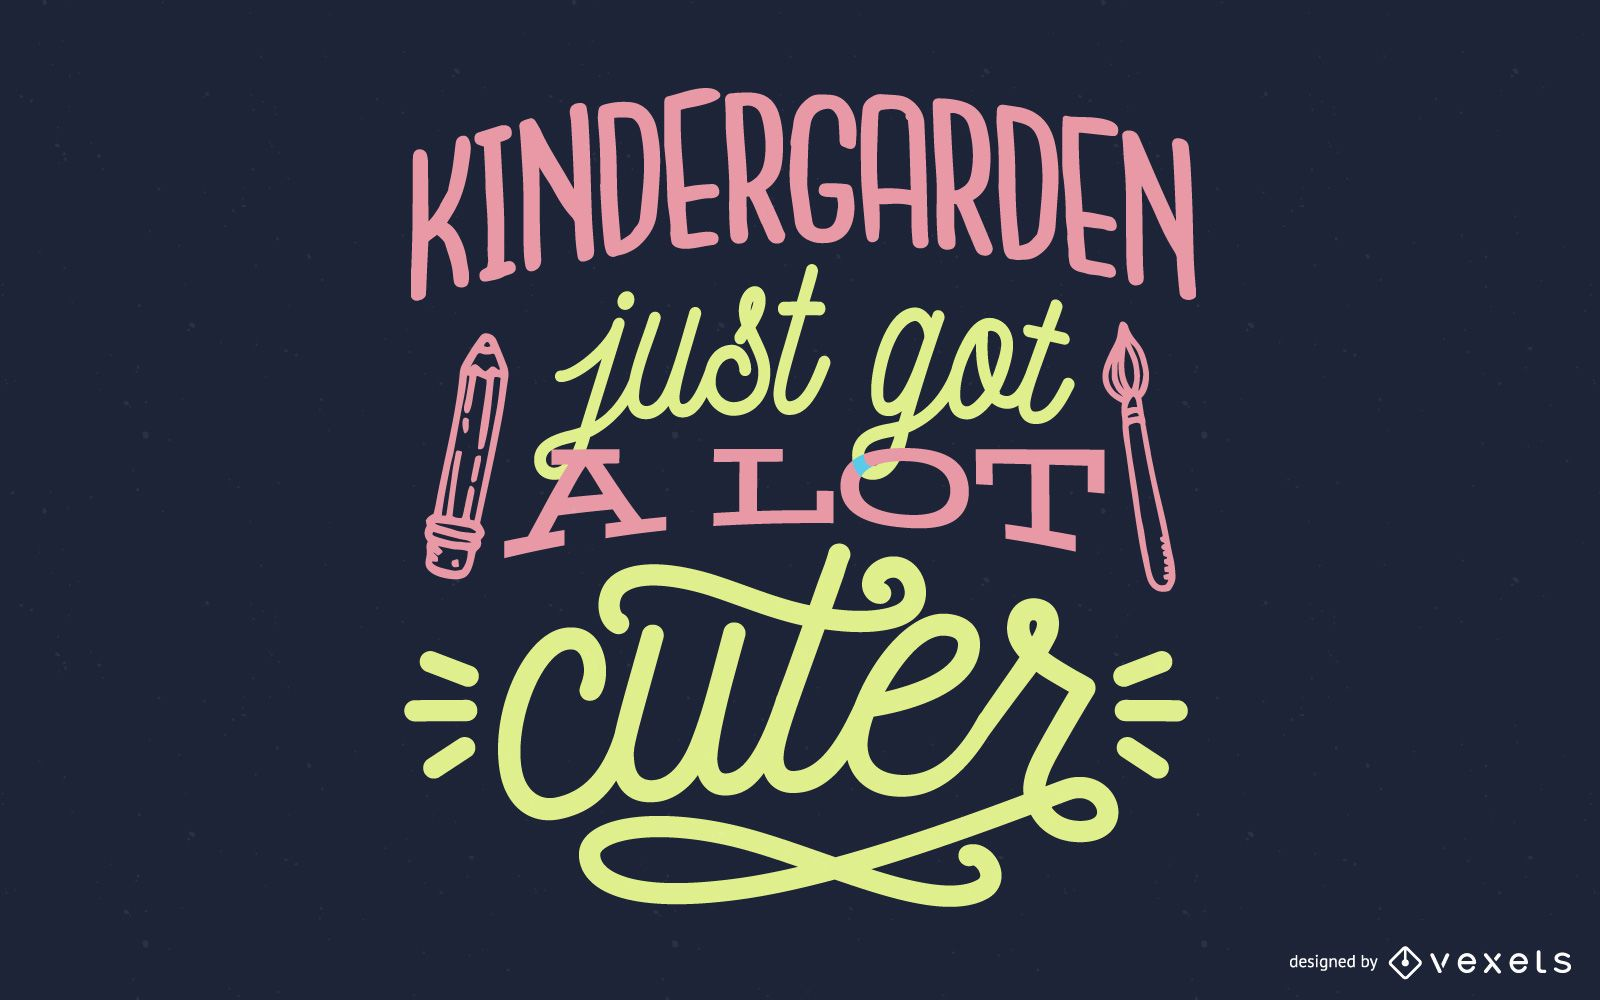 Kindergarden Just Got A Lot Cuter Lettering Design